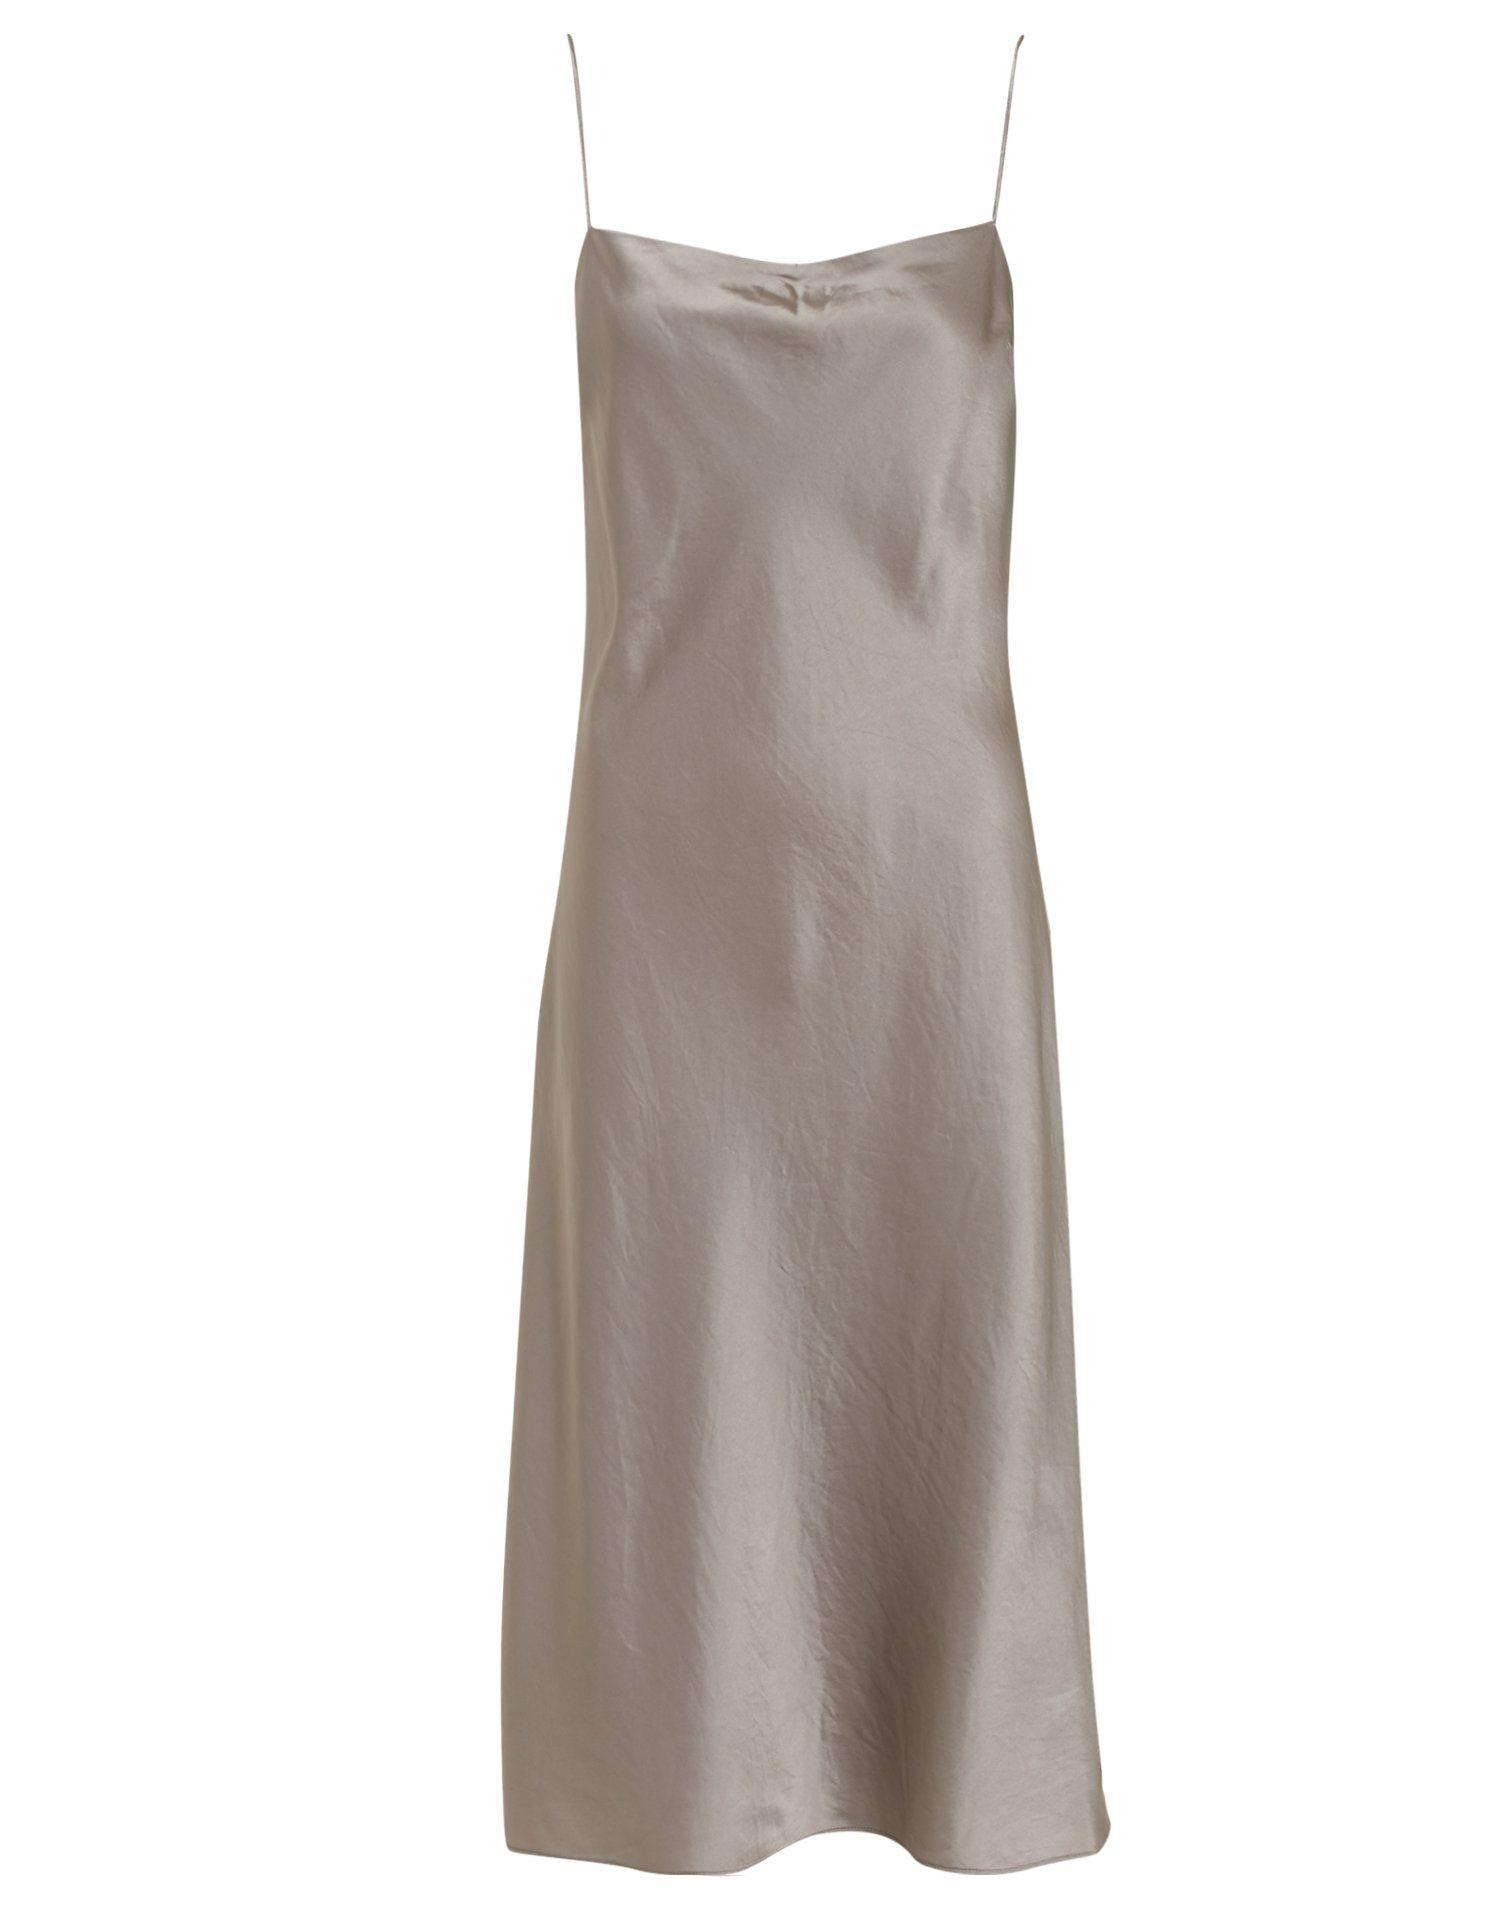 c2c6f011479 Satin Slip Dress - Filippa K - Oyster - Party Dresses - Clothing - Women -